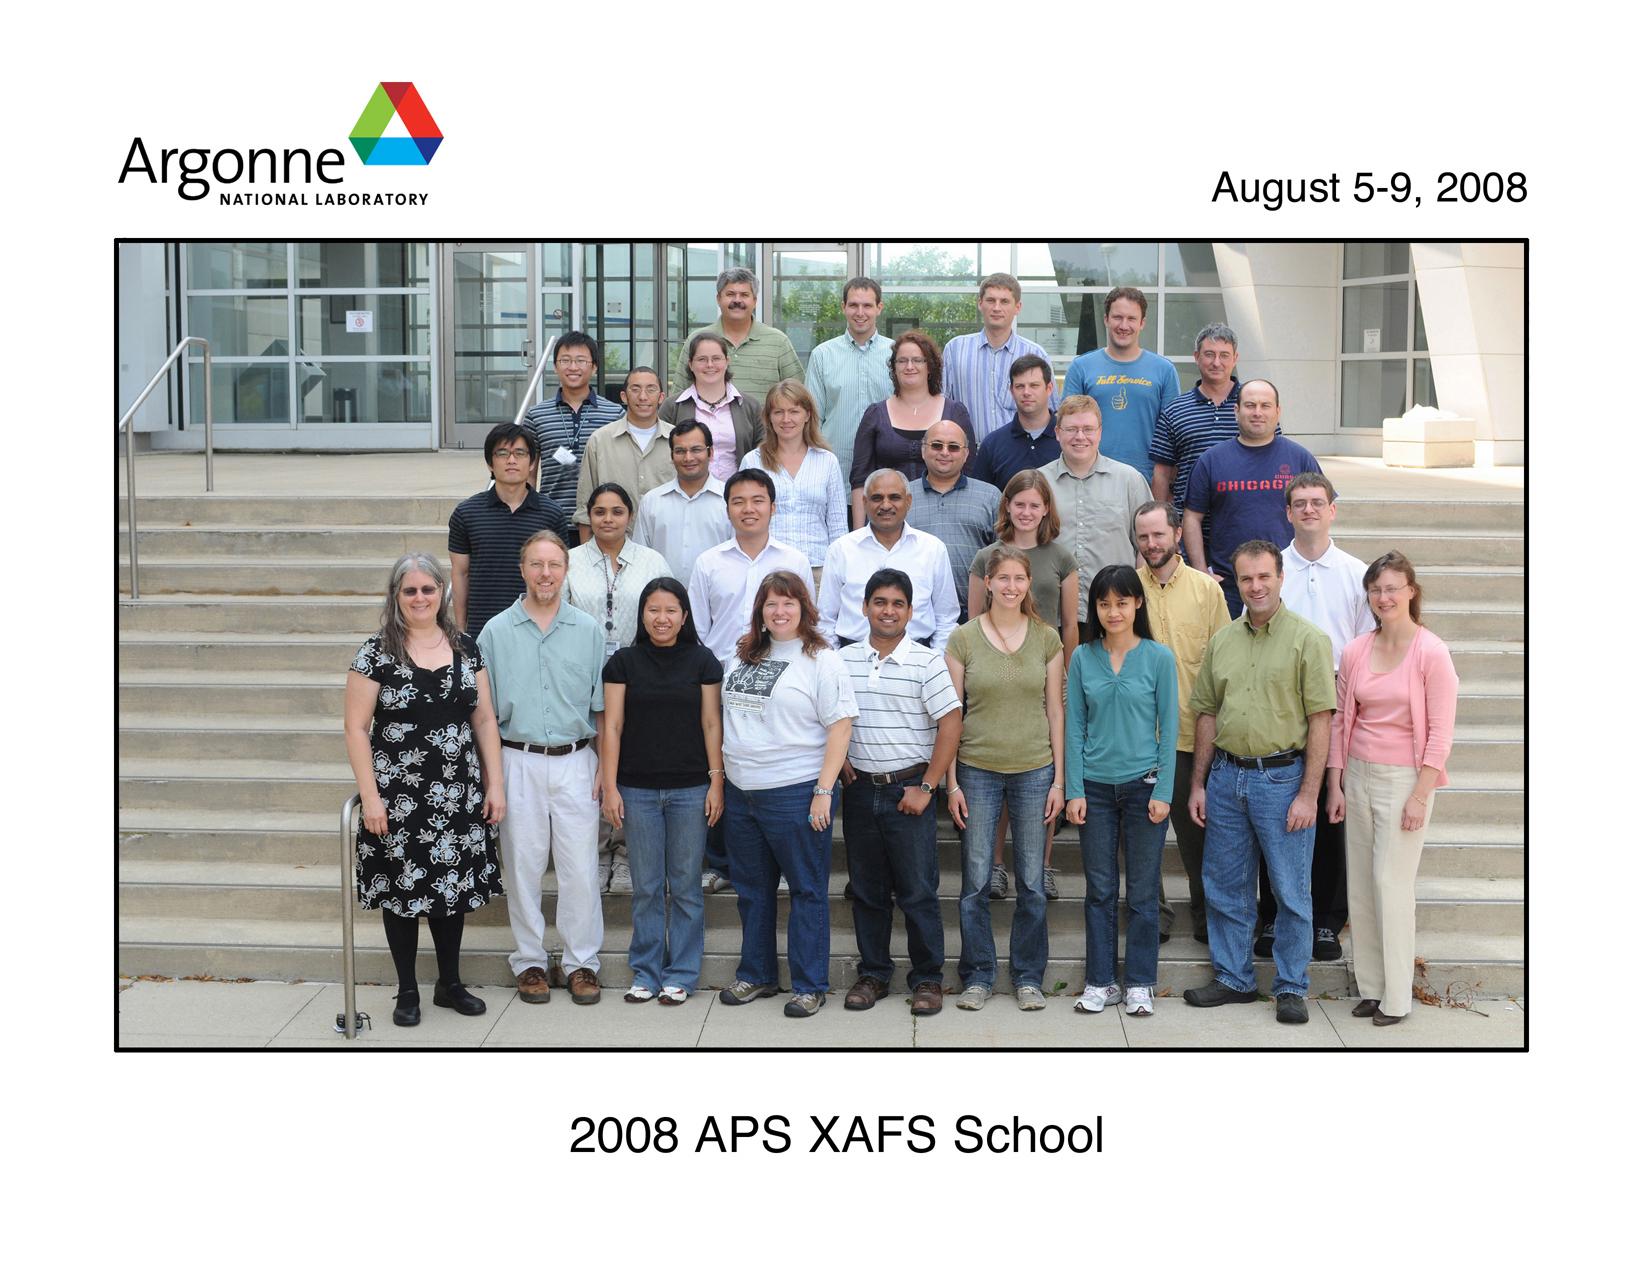 https://docs.xrayabsorption.org/Workshops/APS2008/APS_XAFS2008.jpg